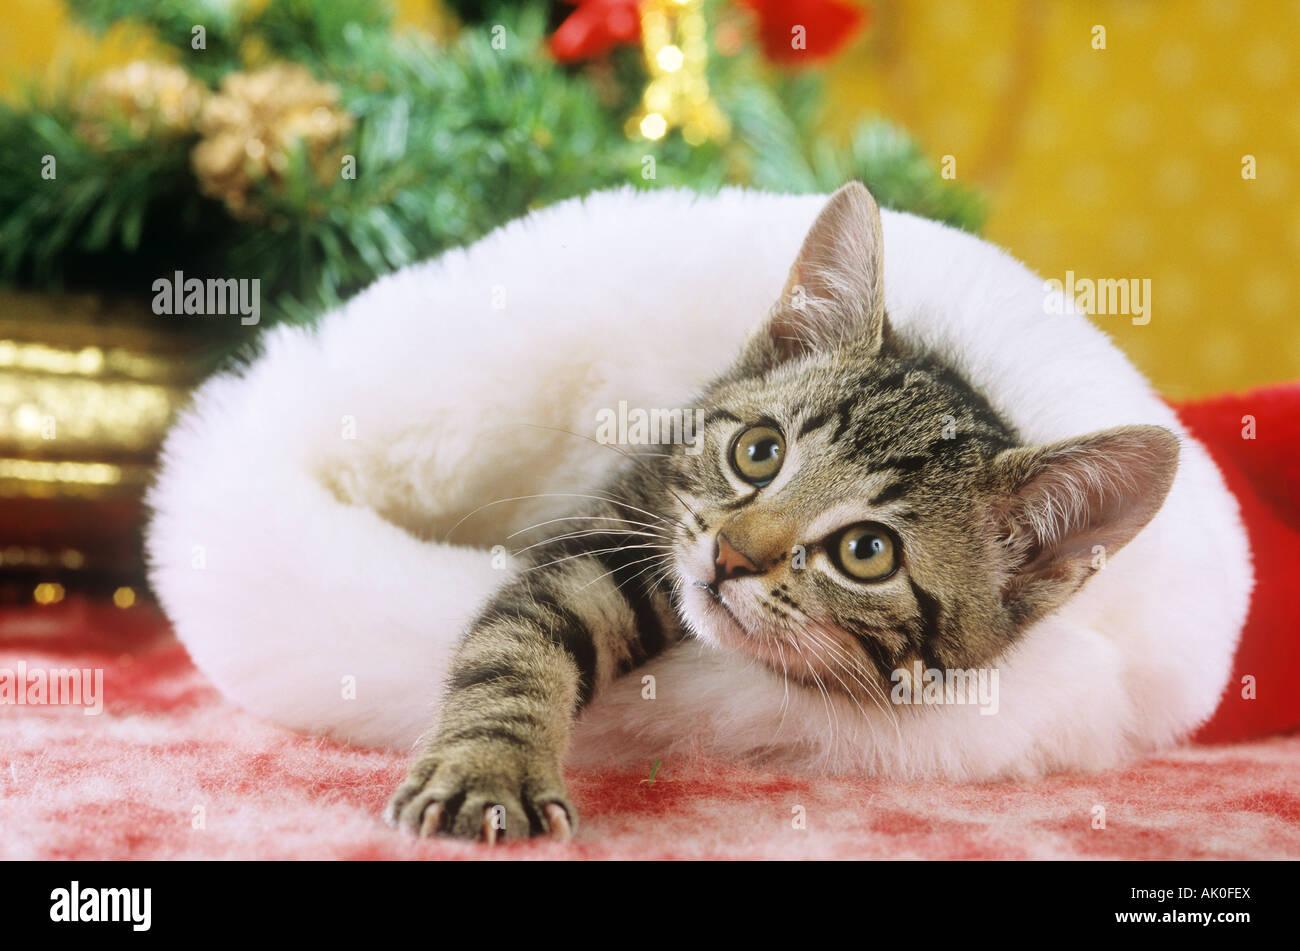 domestic cat - kitten in Santa Claus cap - Stock Image